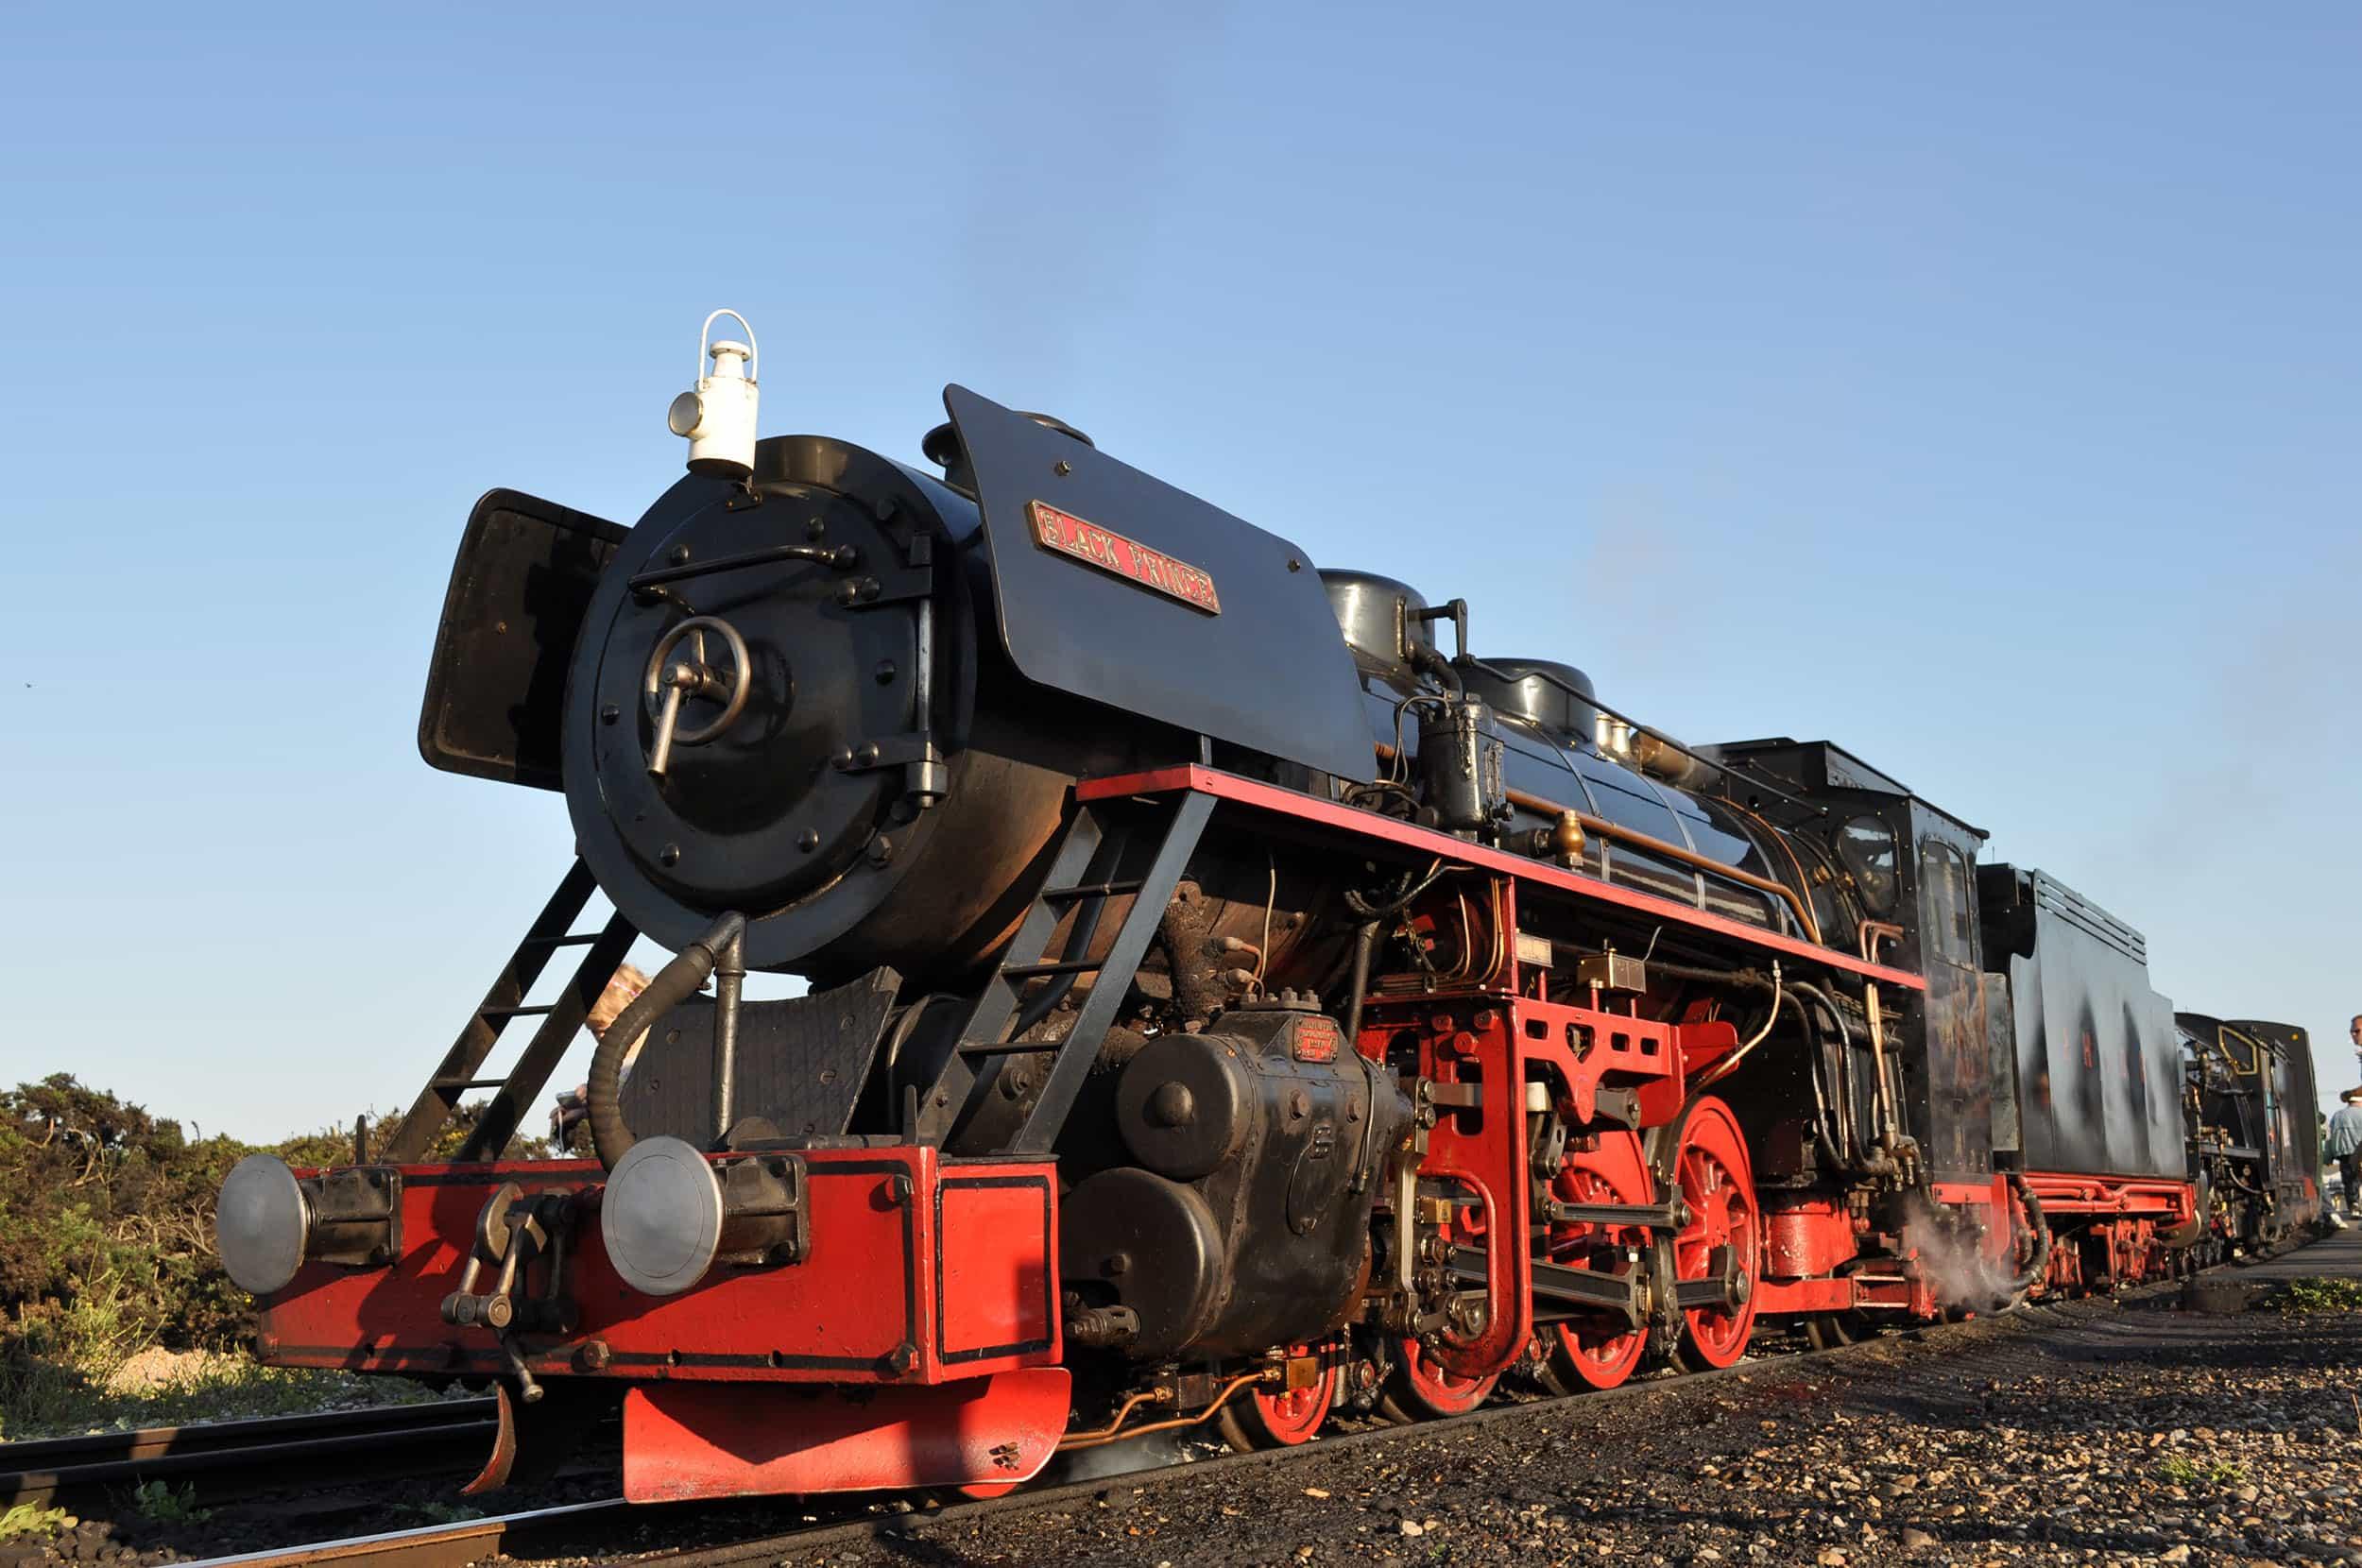 Black Prince - Romney, Hythe & Dymchurch Railway